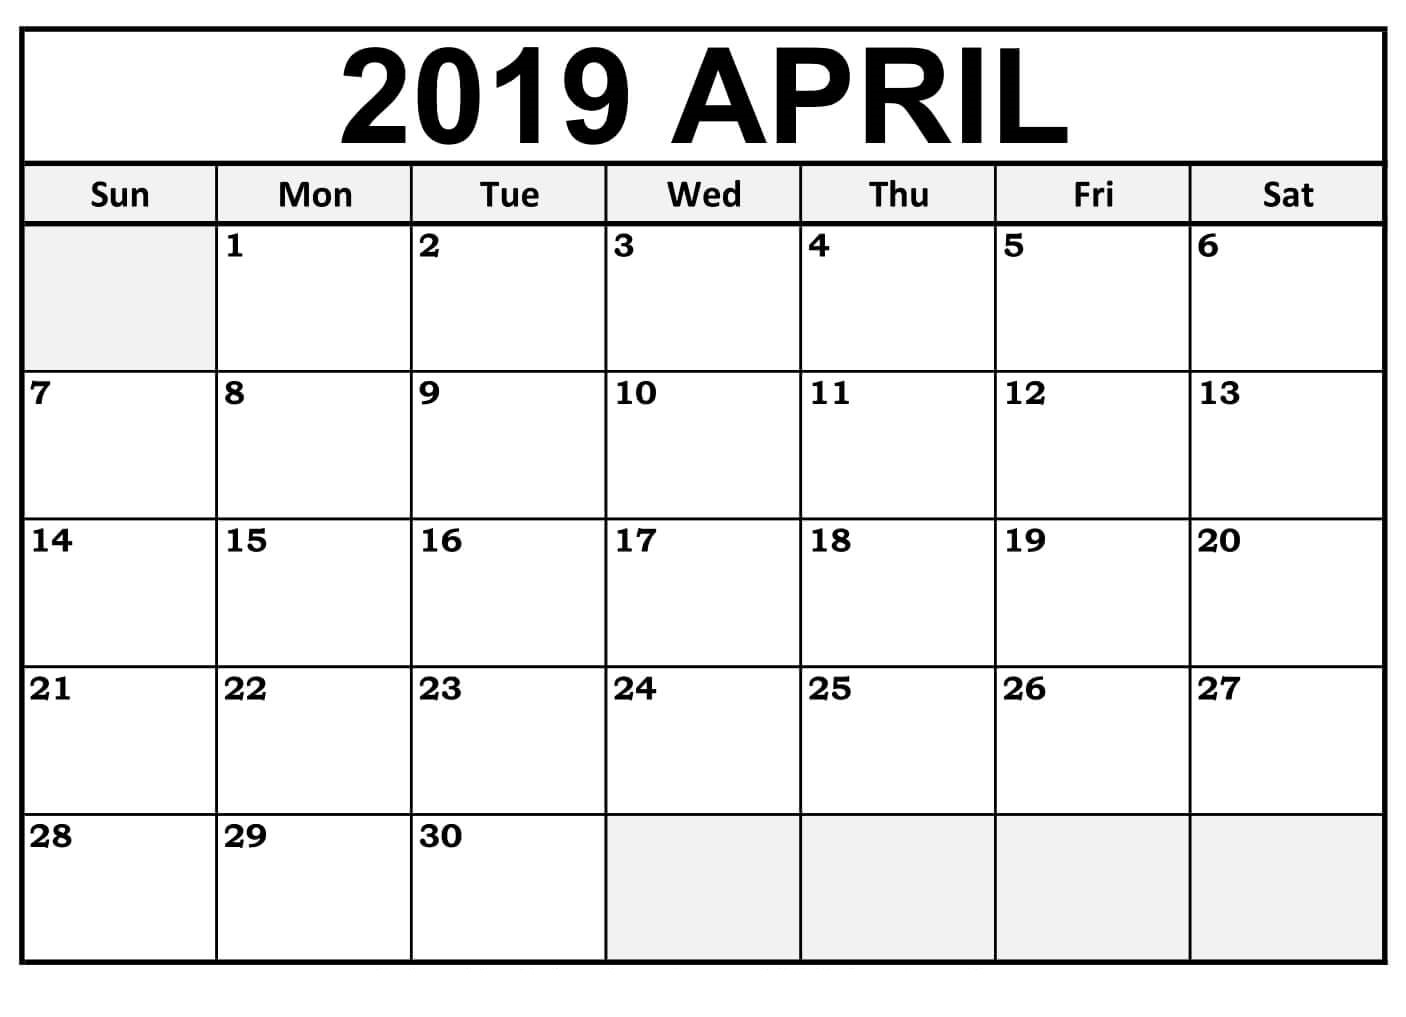 April 2019 Calendar Printable Free Download - Free Printable